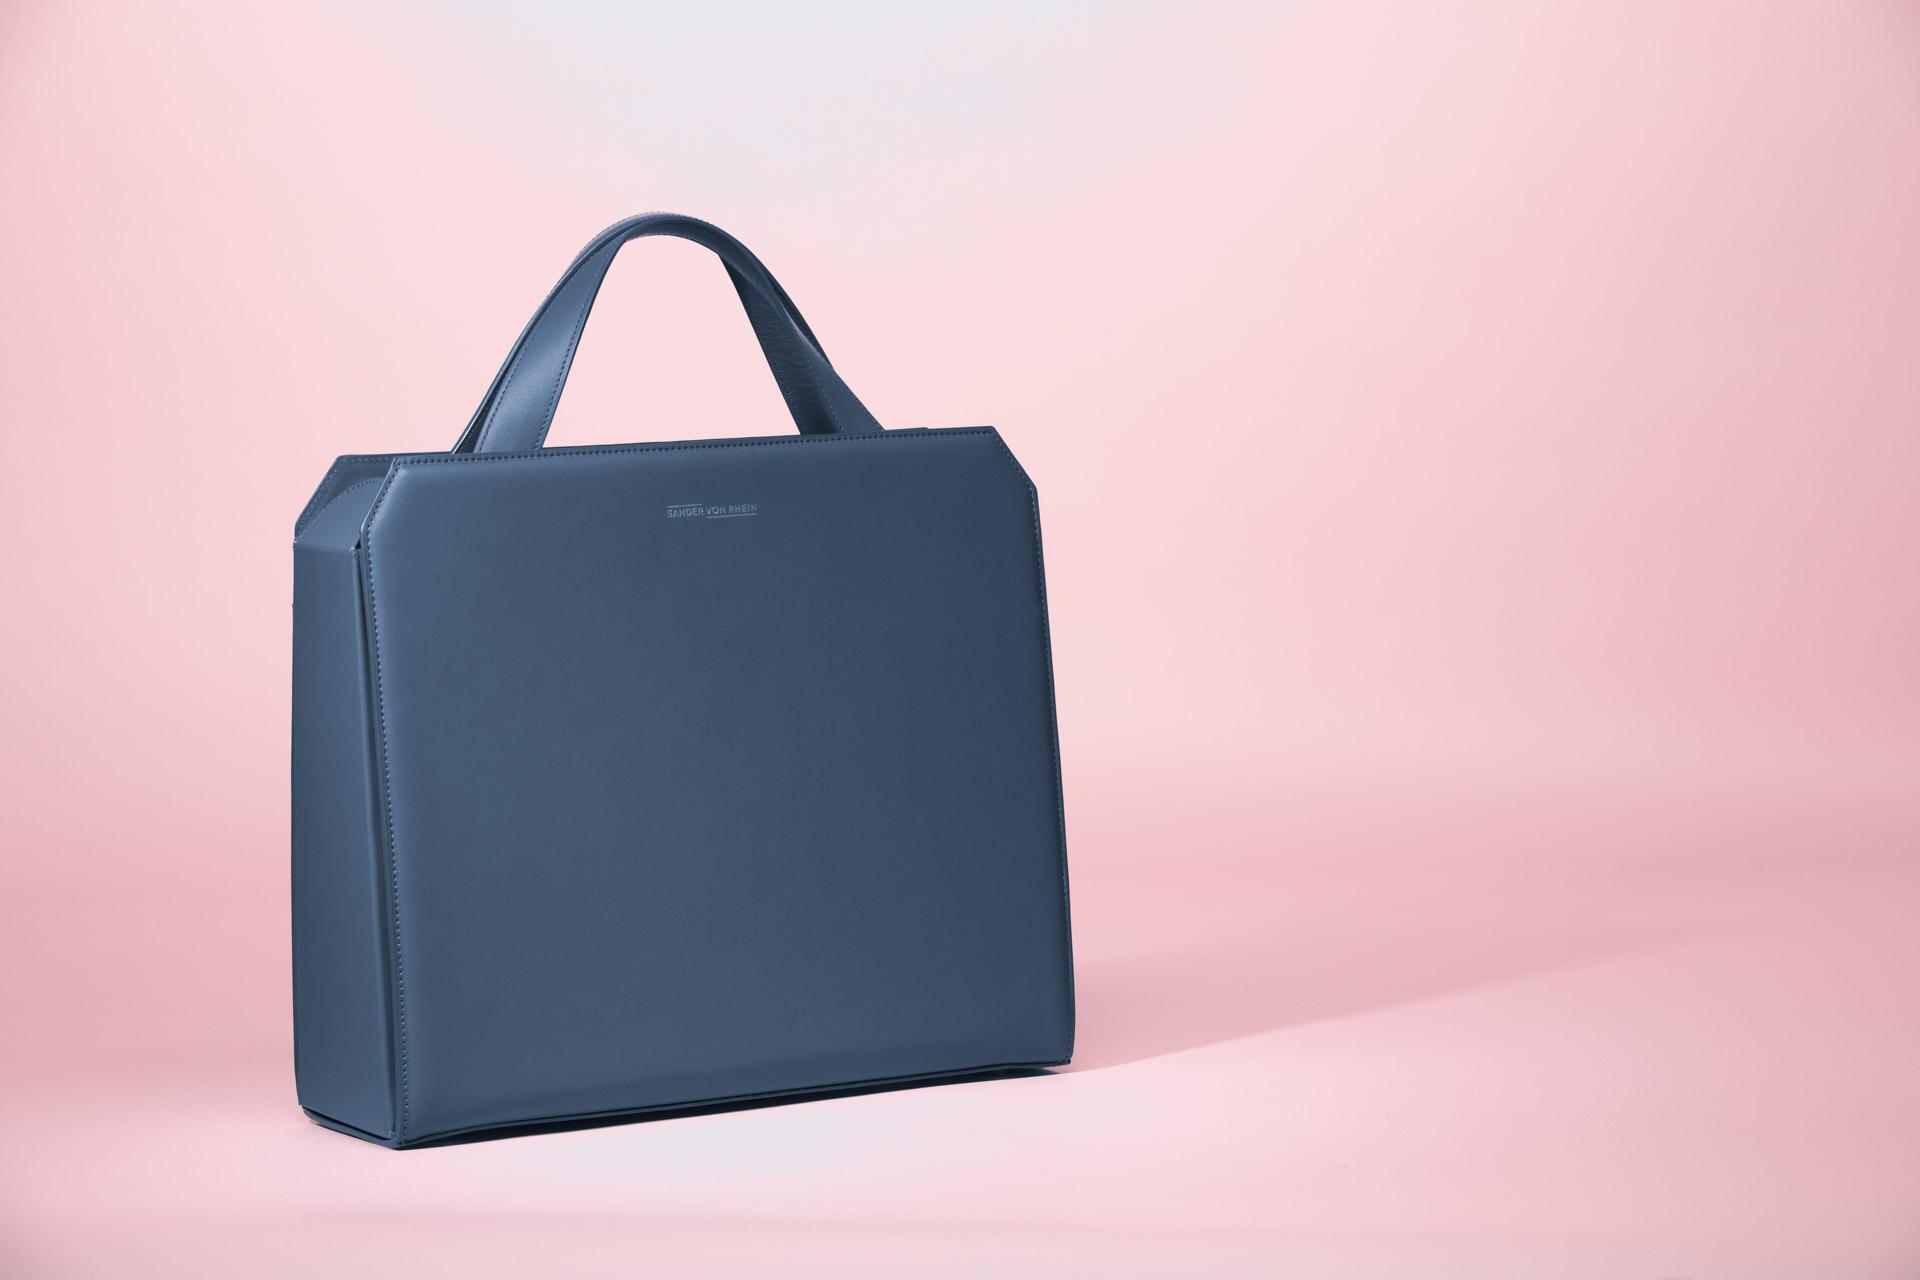 WEB Backup bags shop presentation-63.jpg